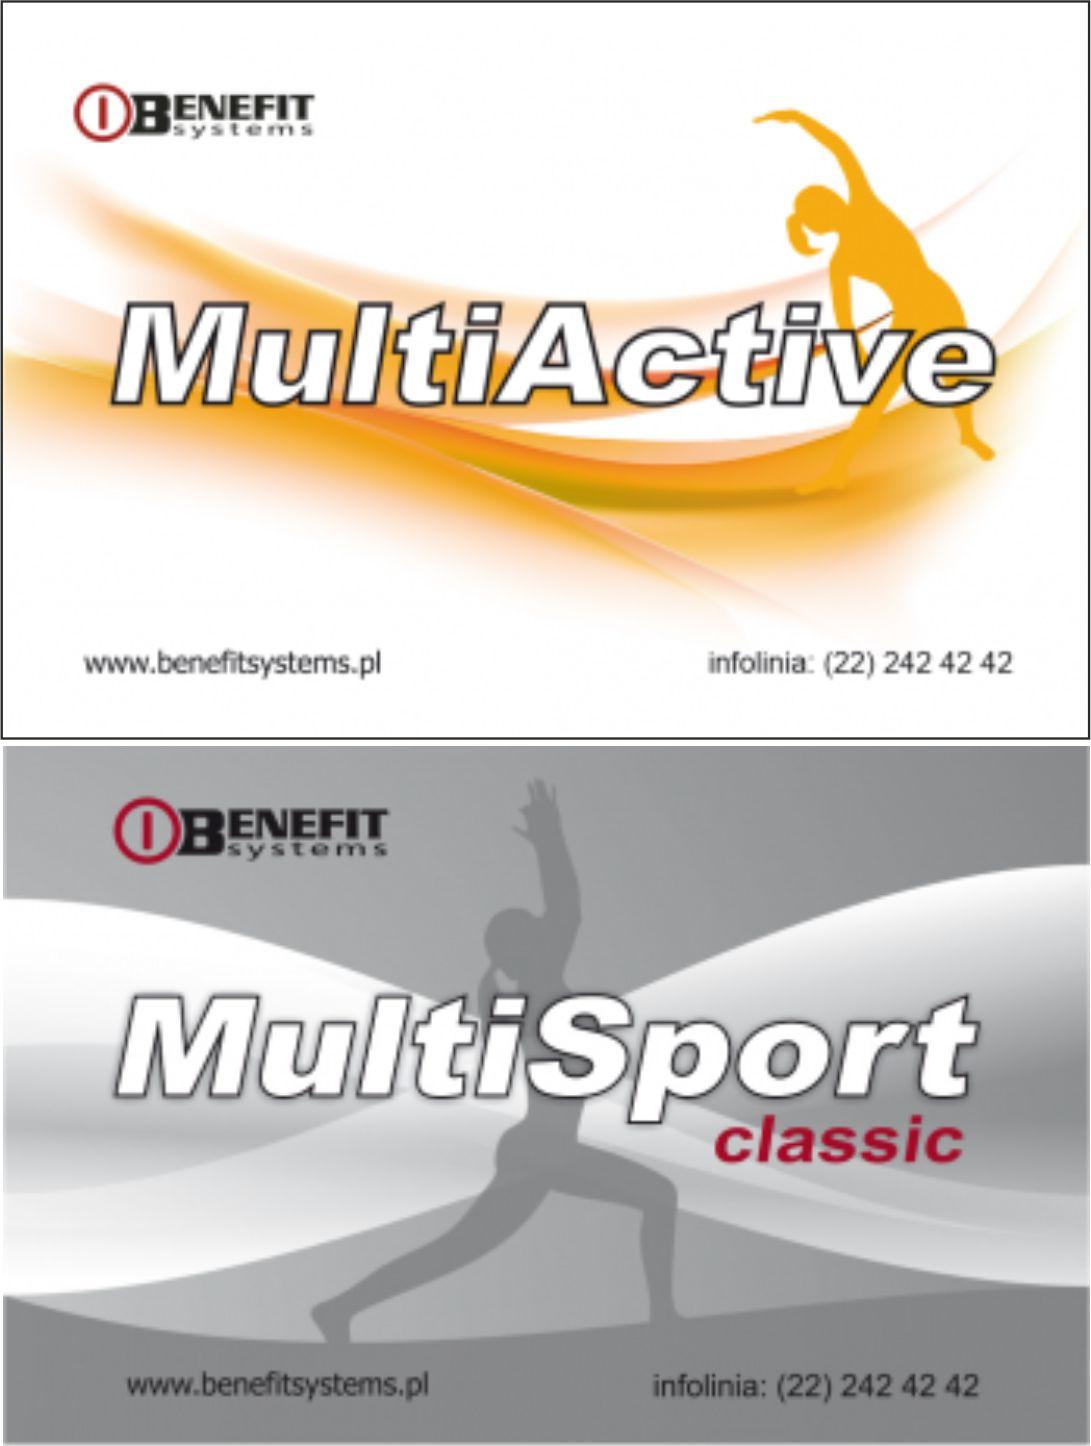 Karty Multisport Classic Oraz Multiactive Honorowane Na Basenie